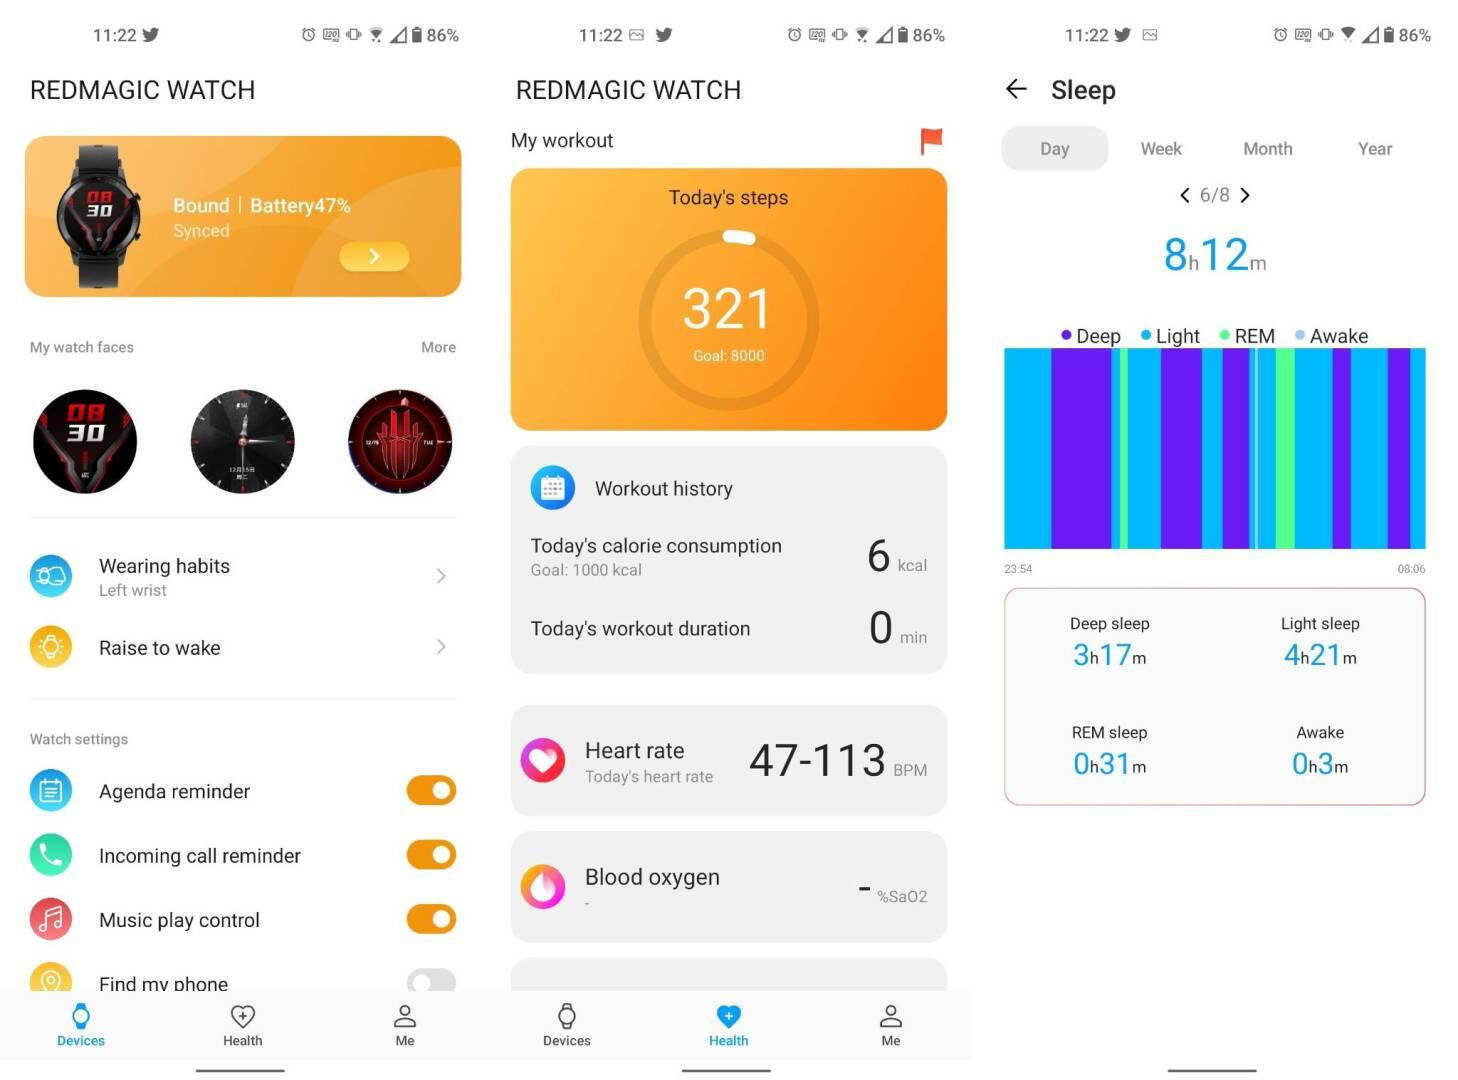 RedMagic Watch App